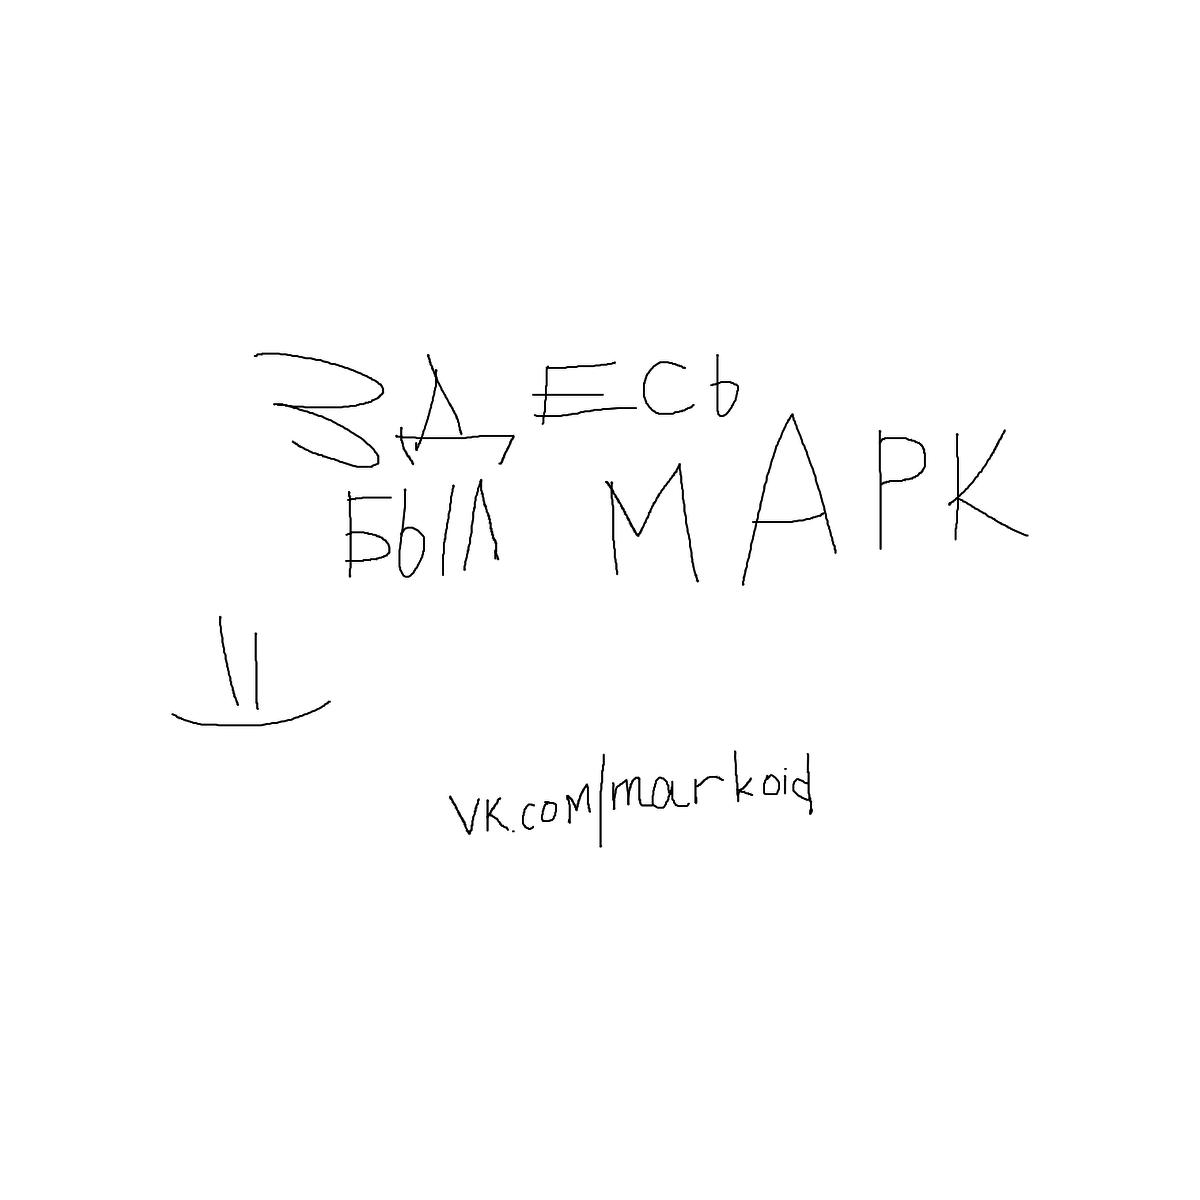 BAAAM drawing#22564 lat:51.7111778259277340lng: 38.7154808044433600